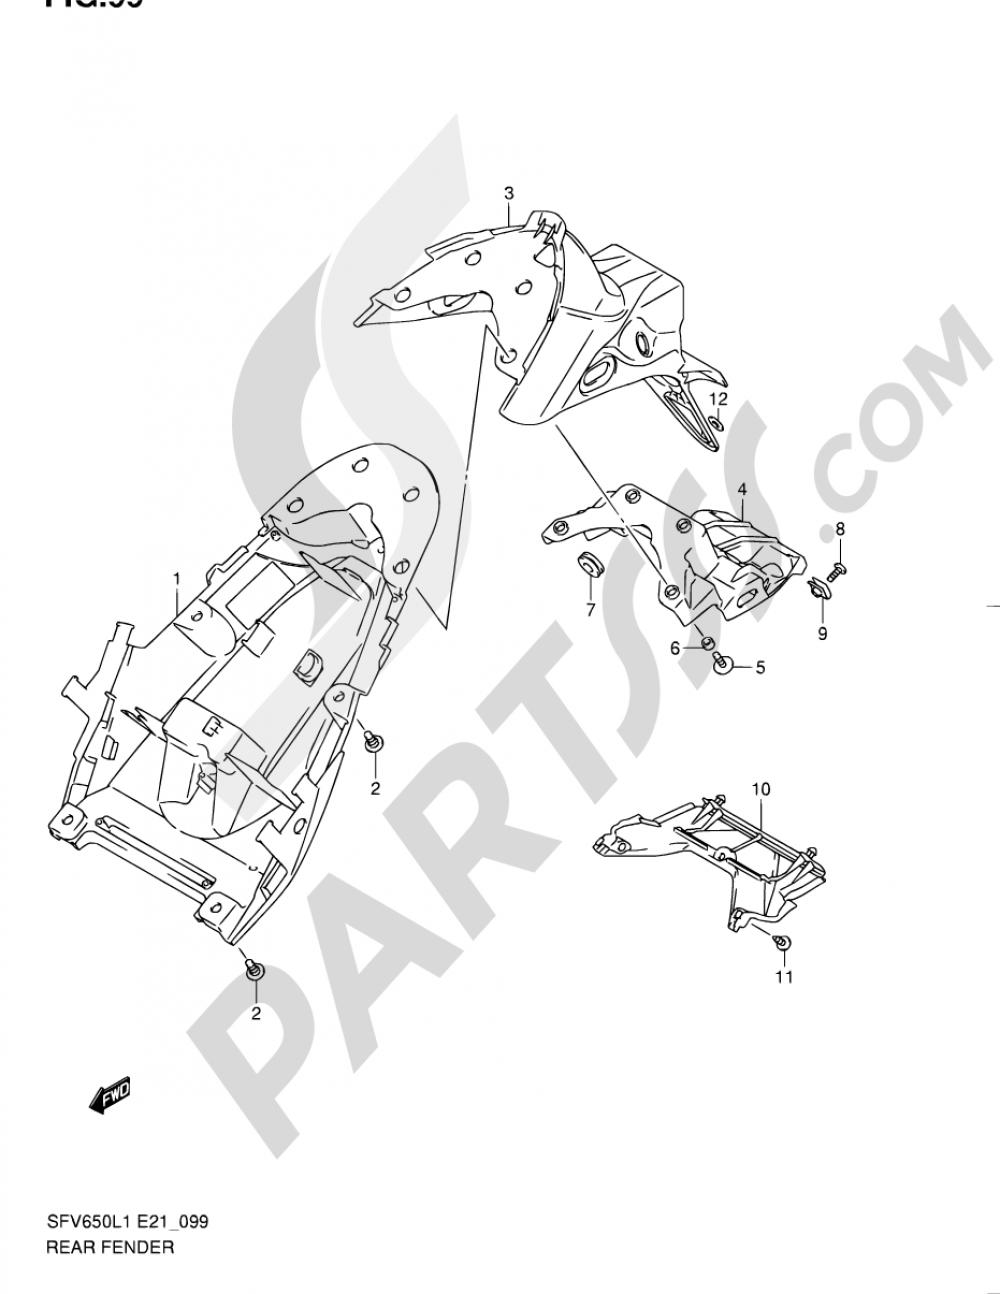 99 - REAR FENDER (SFV650UL1 E21) Suzuki GLADIUS SFV650A 2011